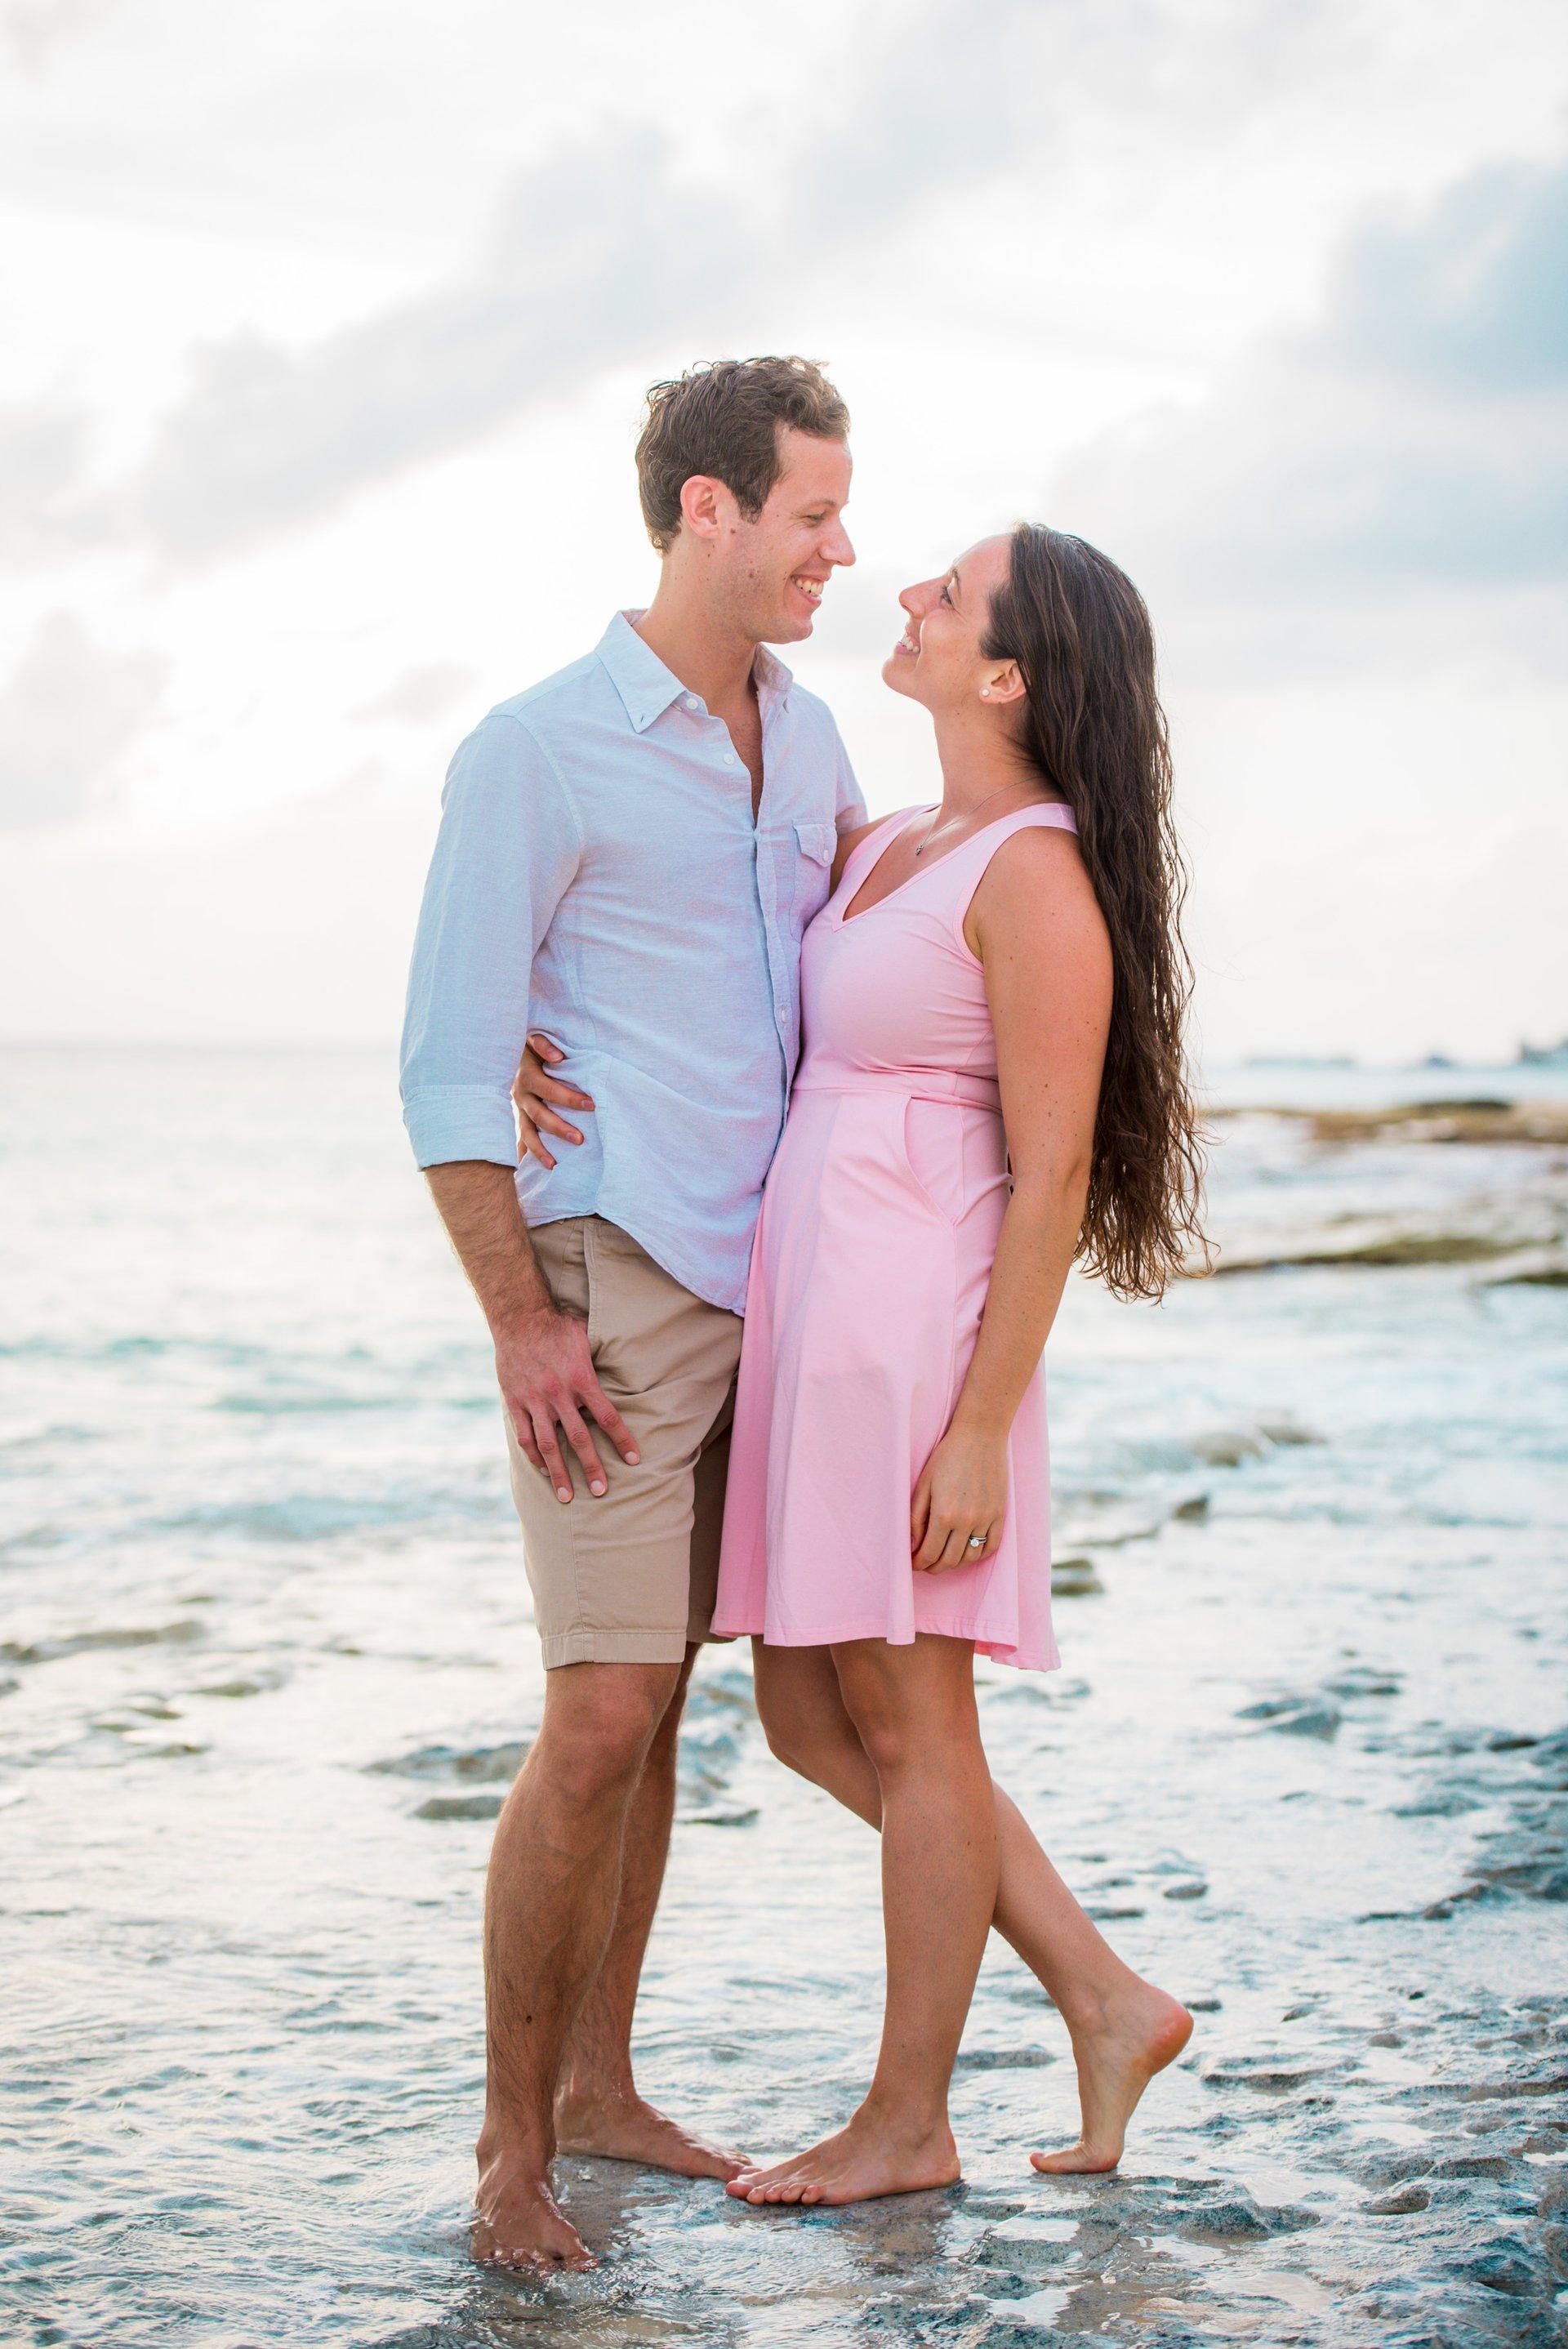 Cayman dating